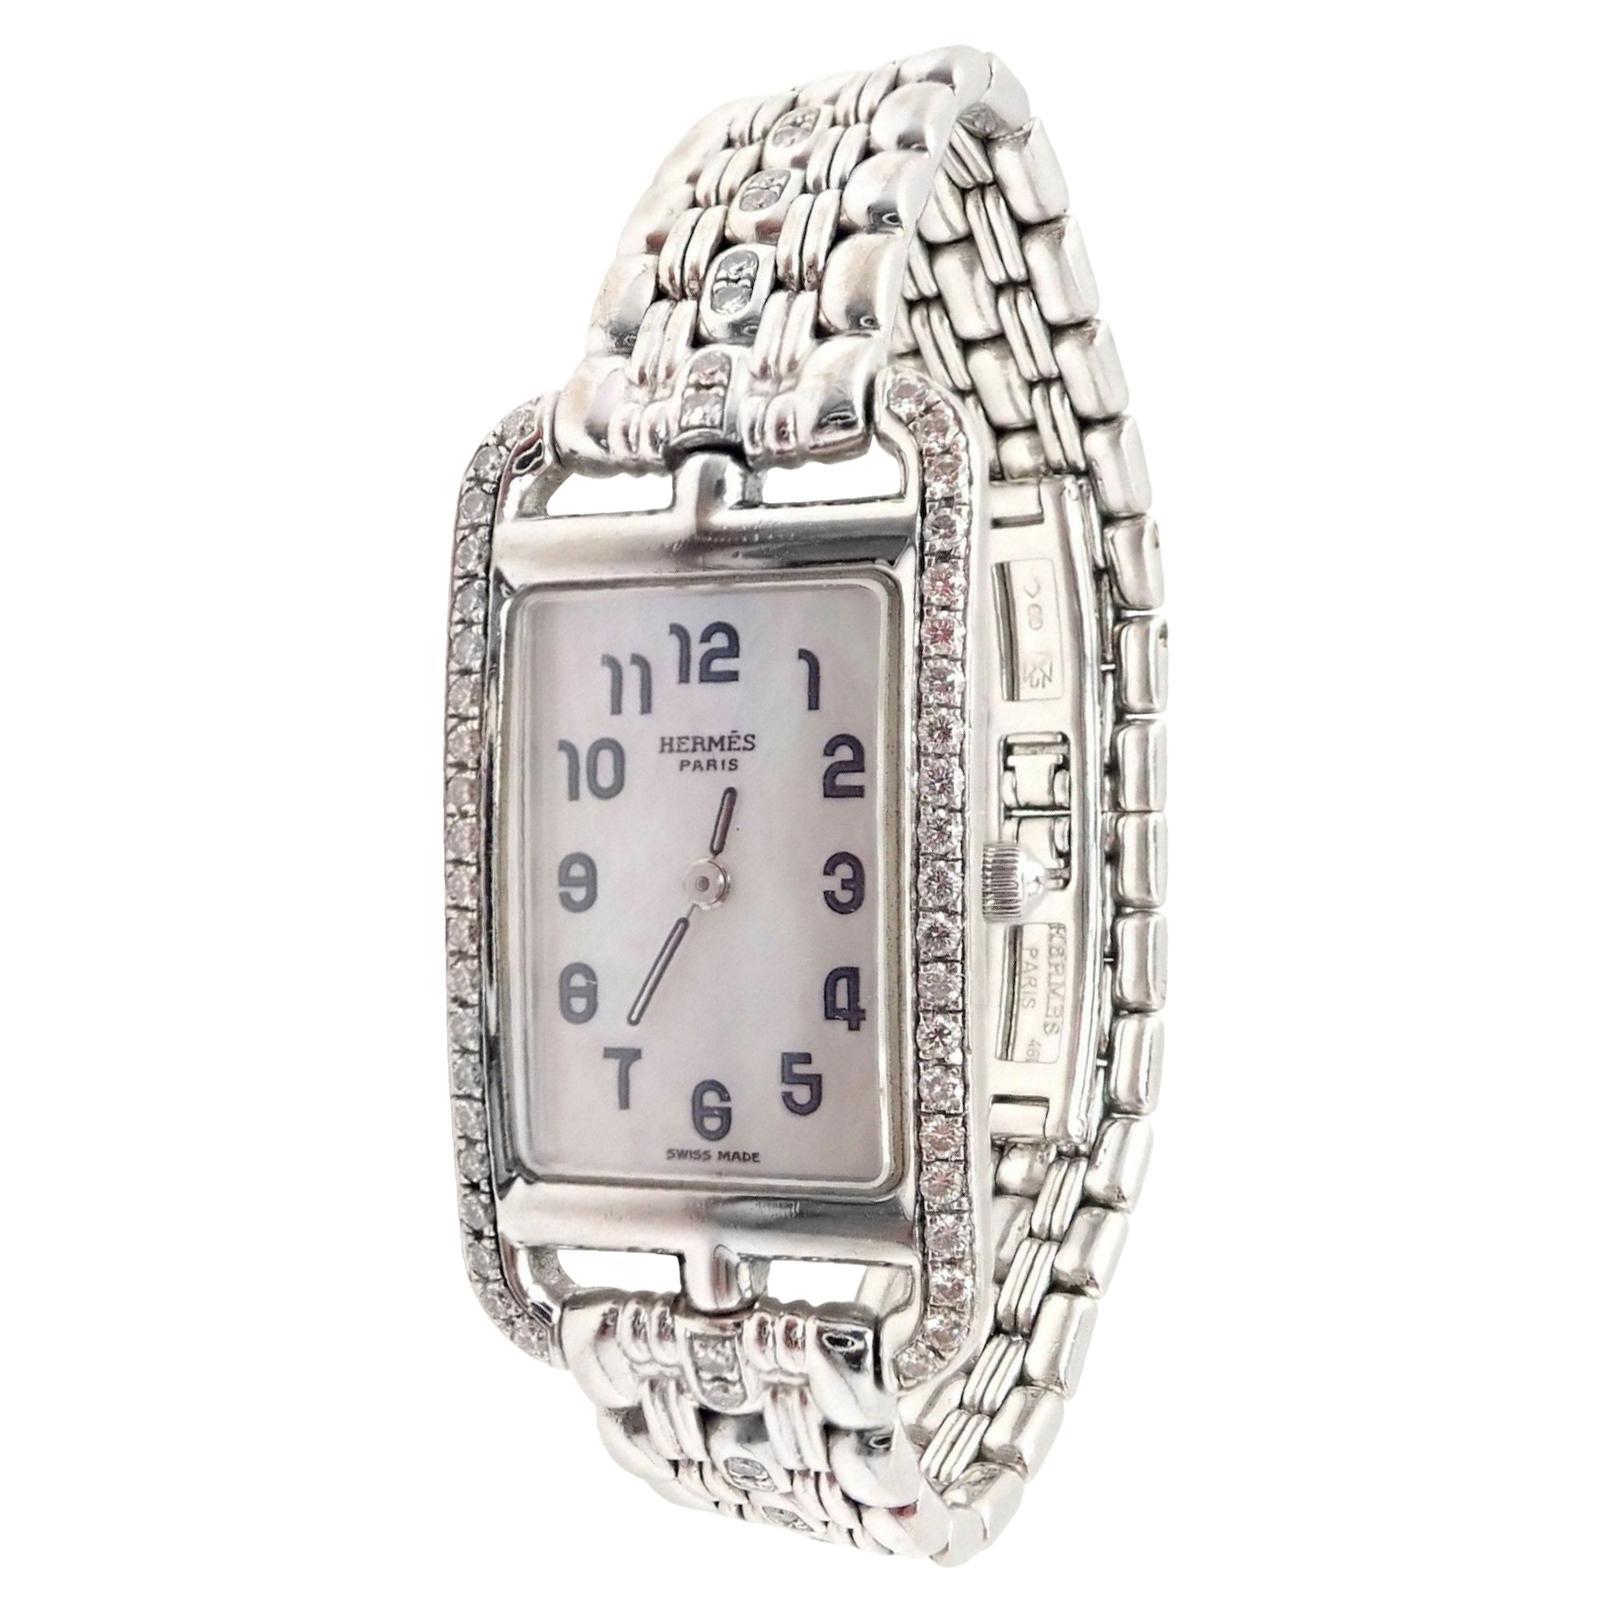 Hermès Ladies White Gold Diamond Cape Cod Nantucket Quartz Wristwatch